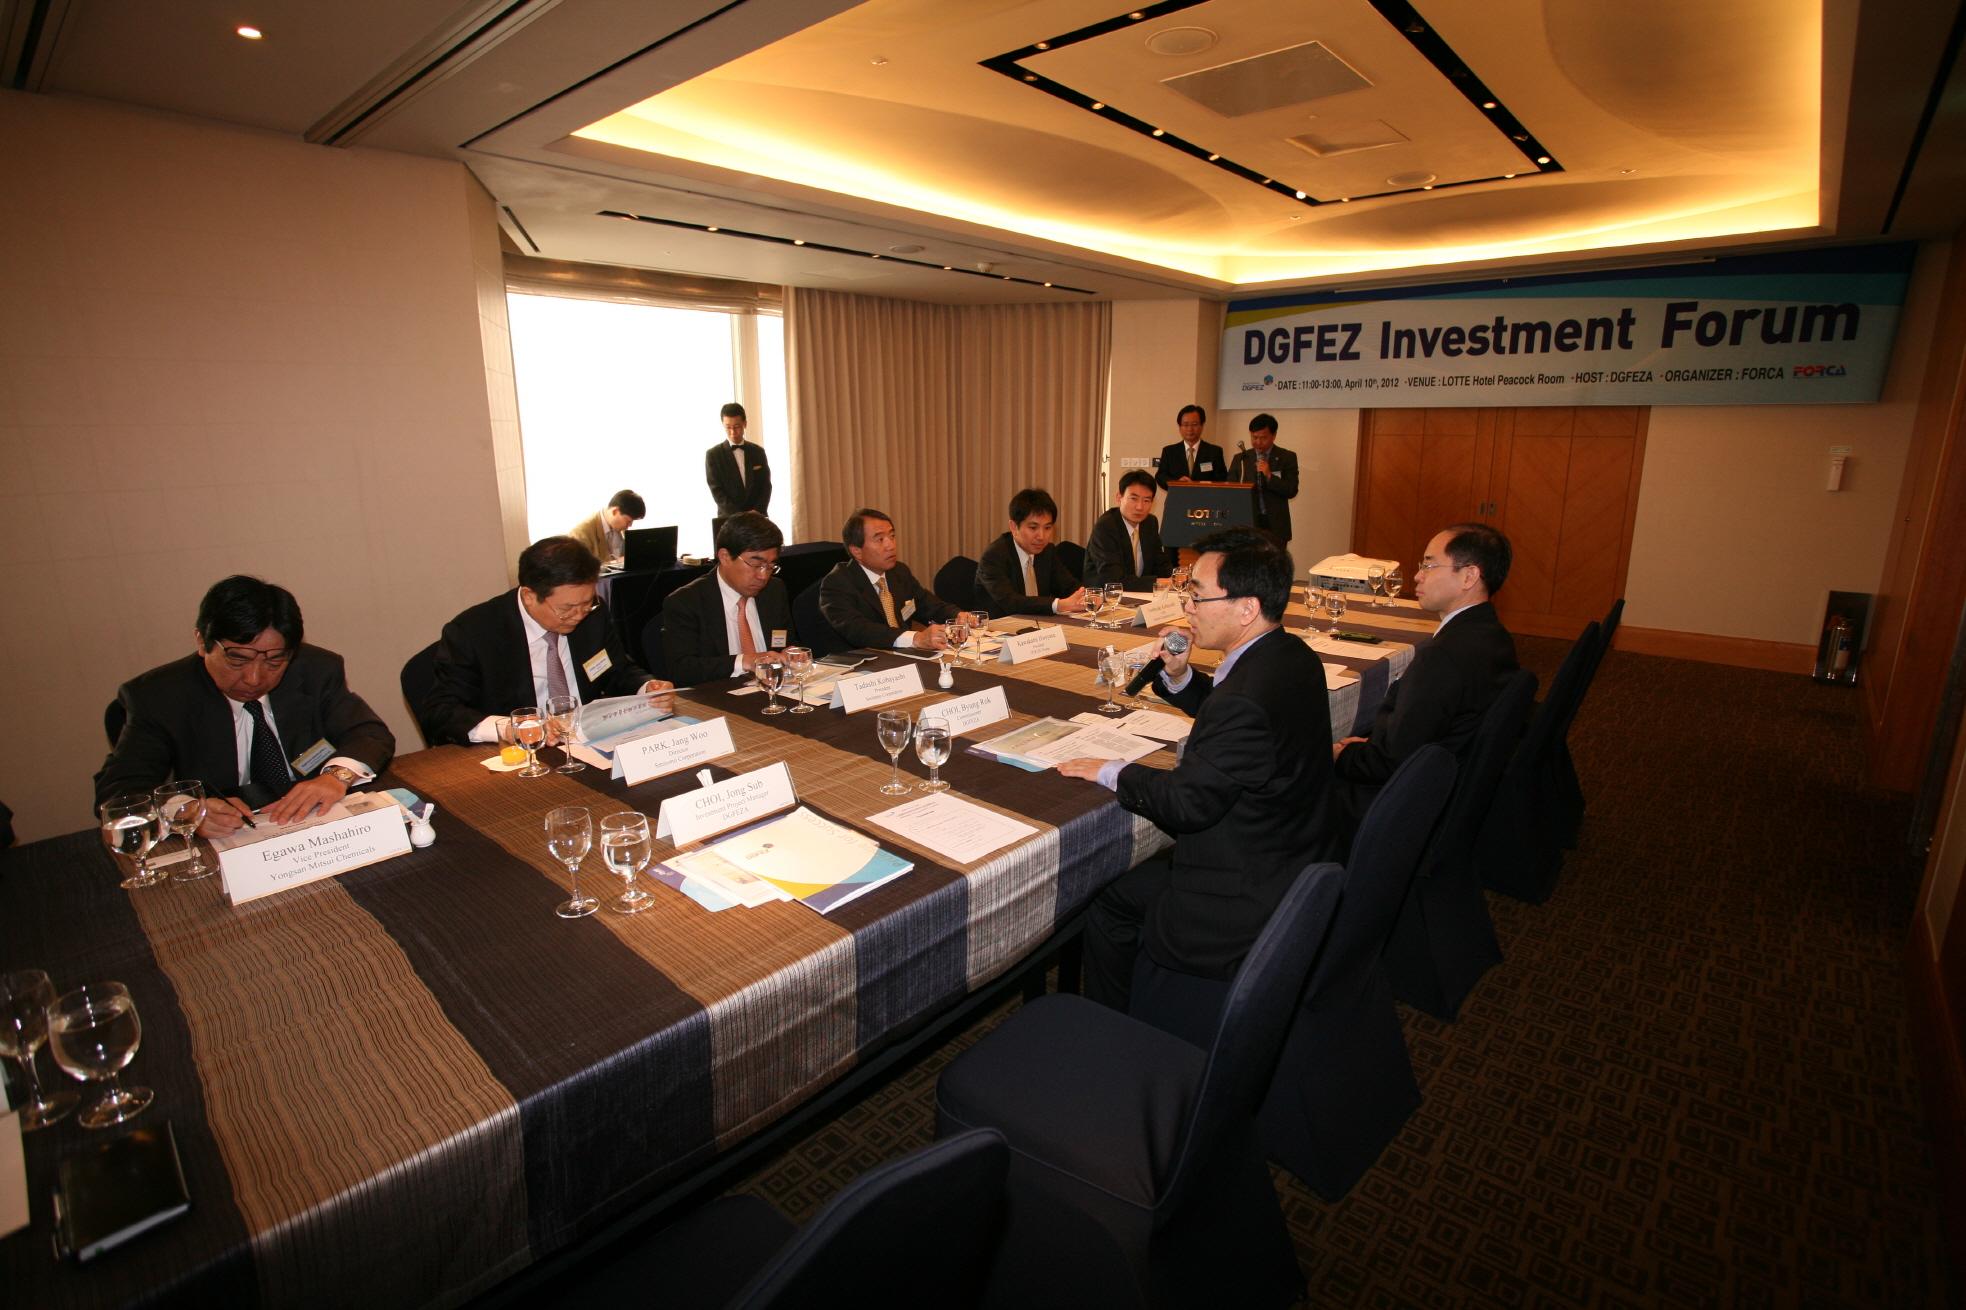 DGFEZ Investment Forum for Jap...